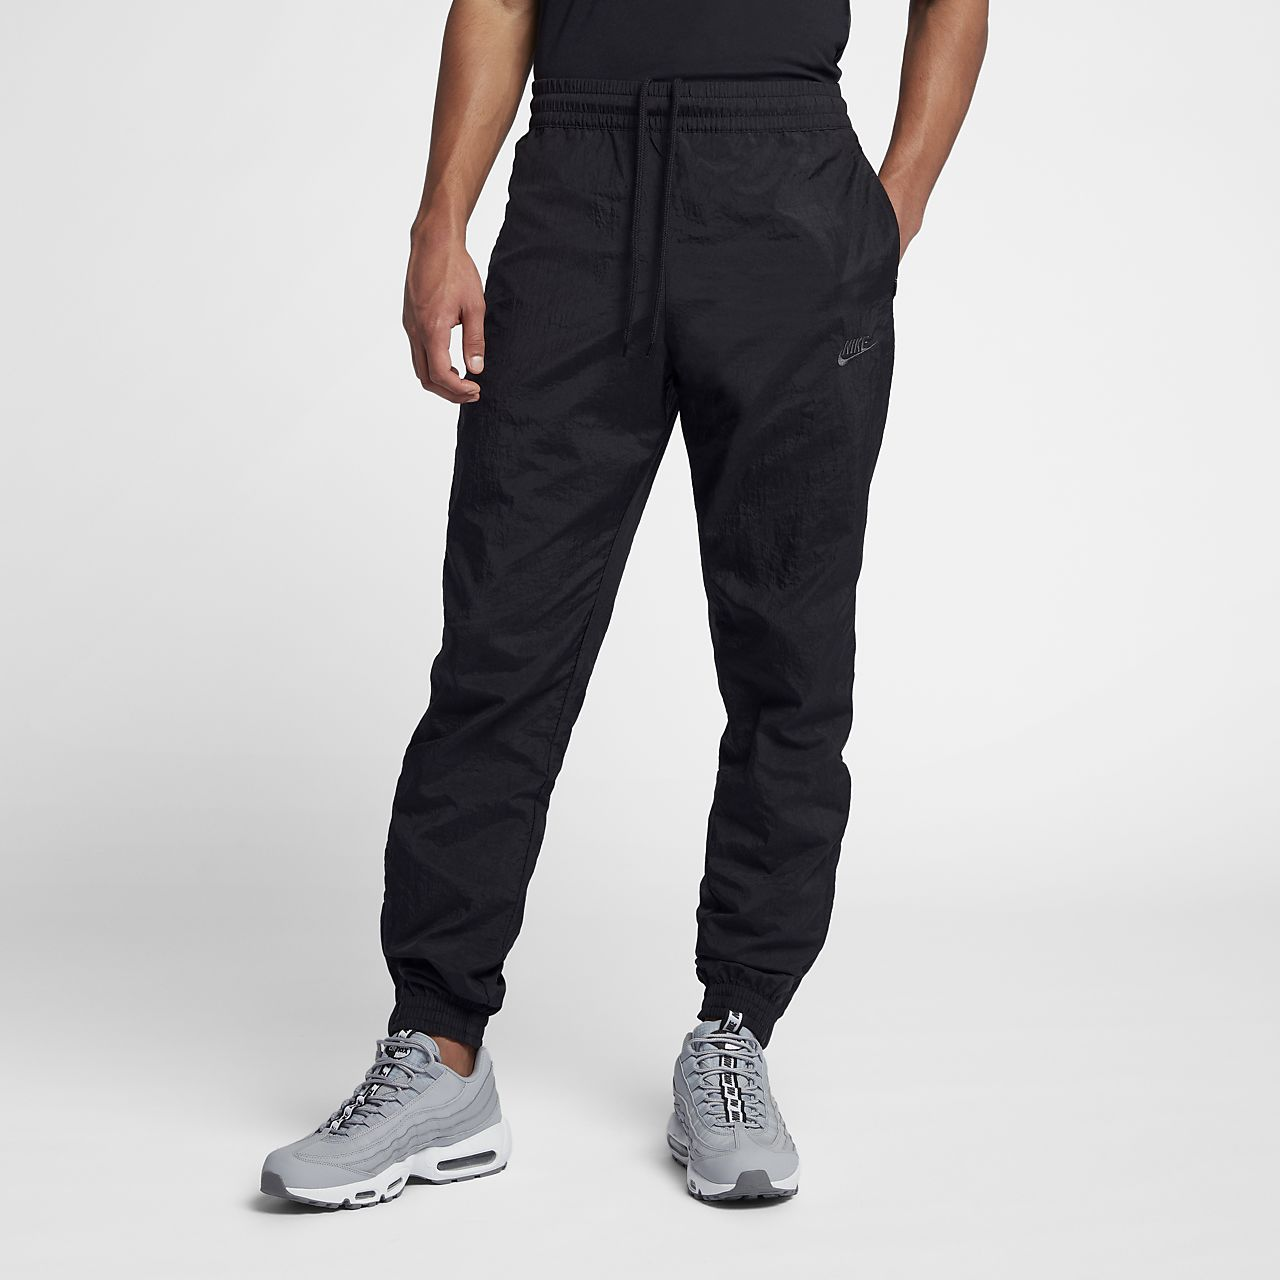 4a9cc1133ca0 Low Resolution Nike Sportswear Woven Joggers Nike Sportswear Woven Joggers